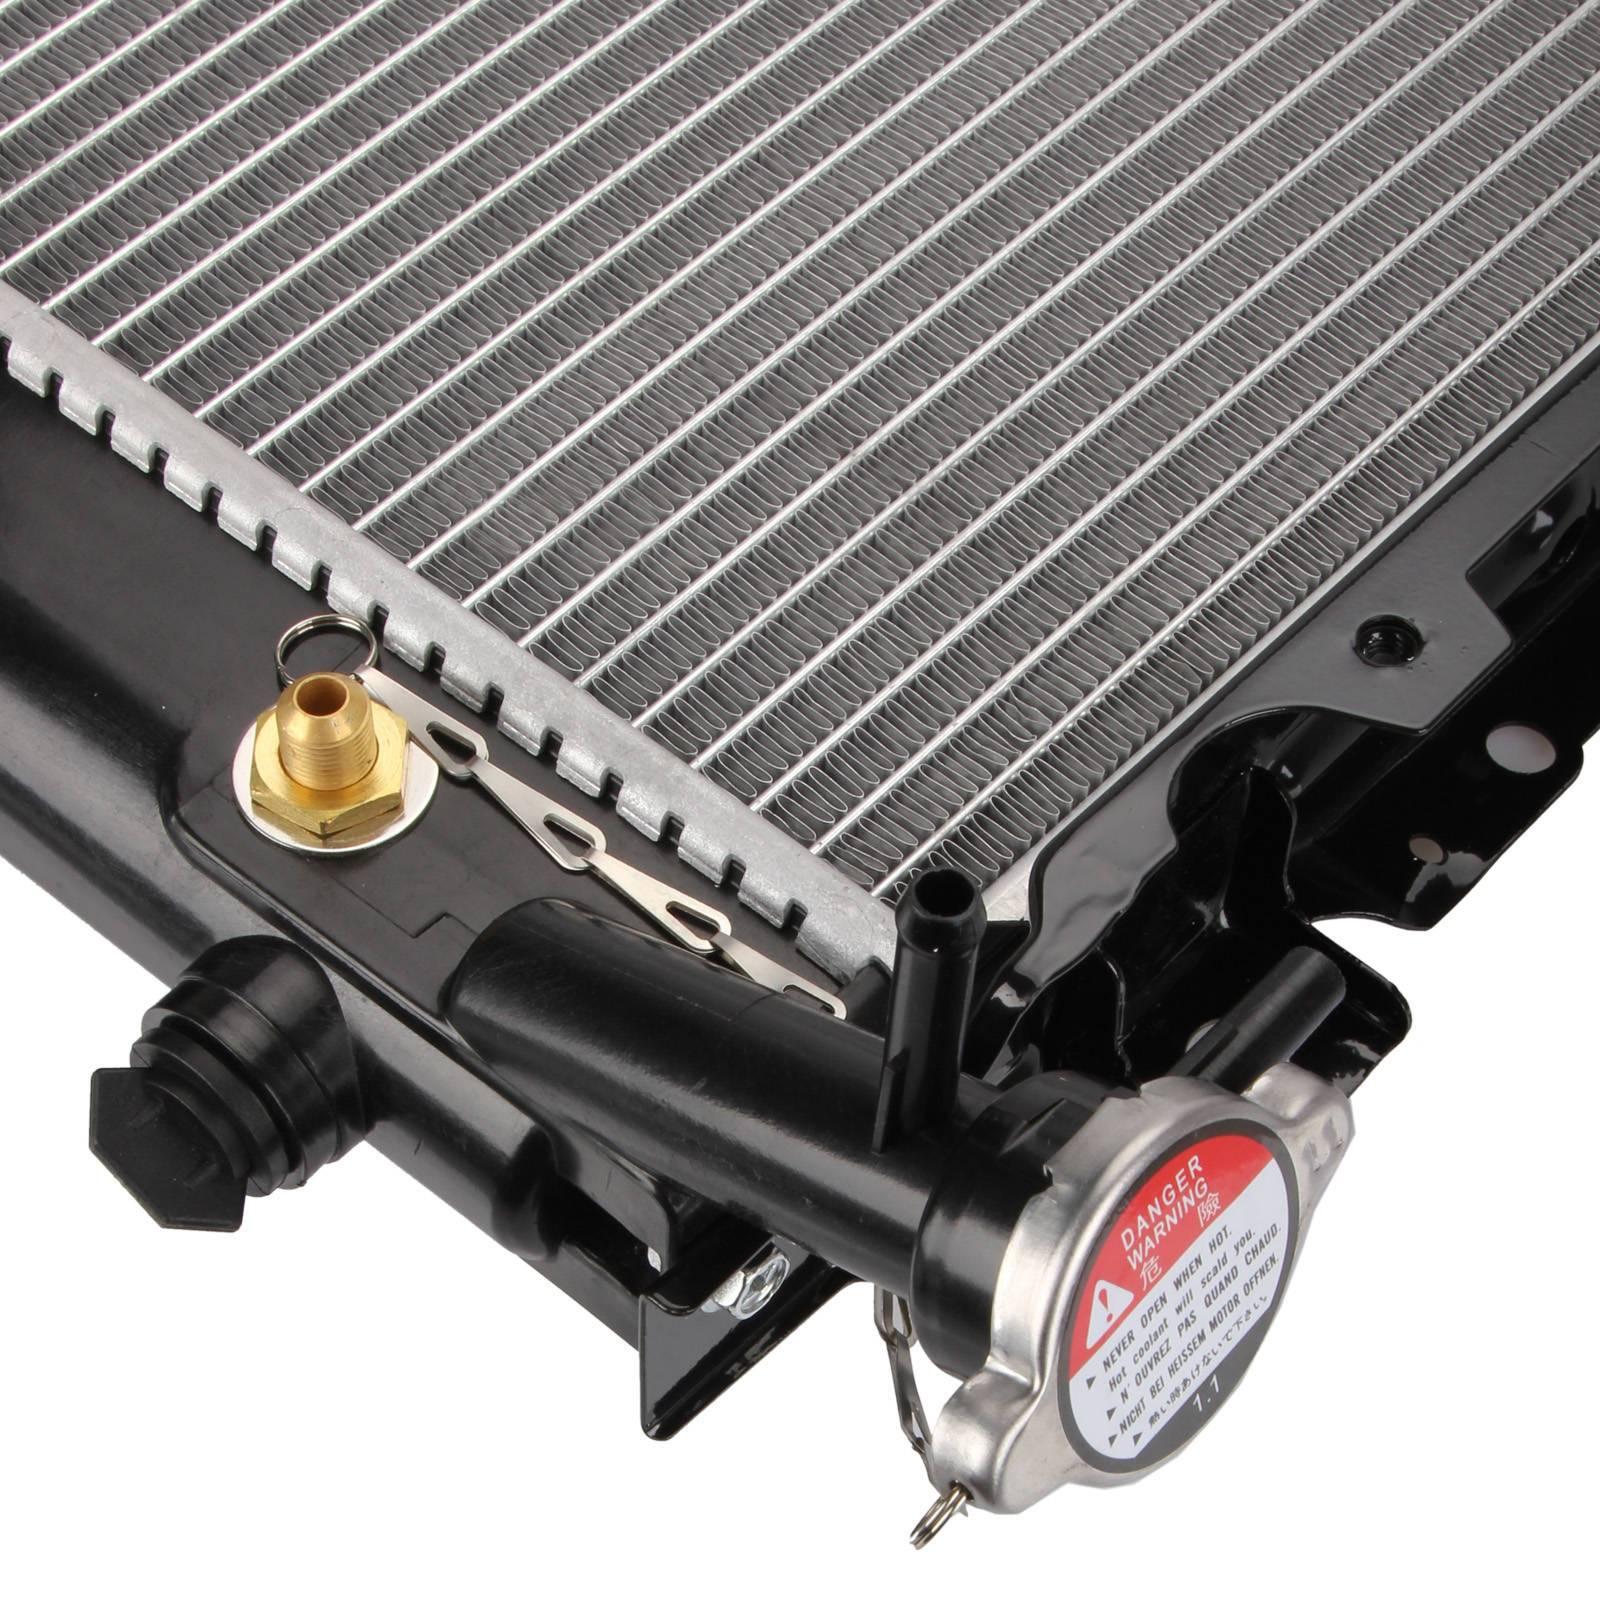 Dromedary-Radiator For Nissan Gq Patrol Y60 Series 42l Petrol Tb42s Tb42e Automanual-3